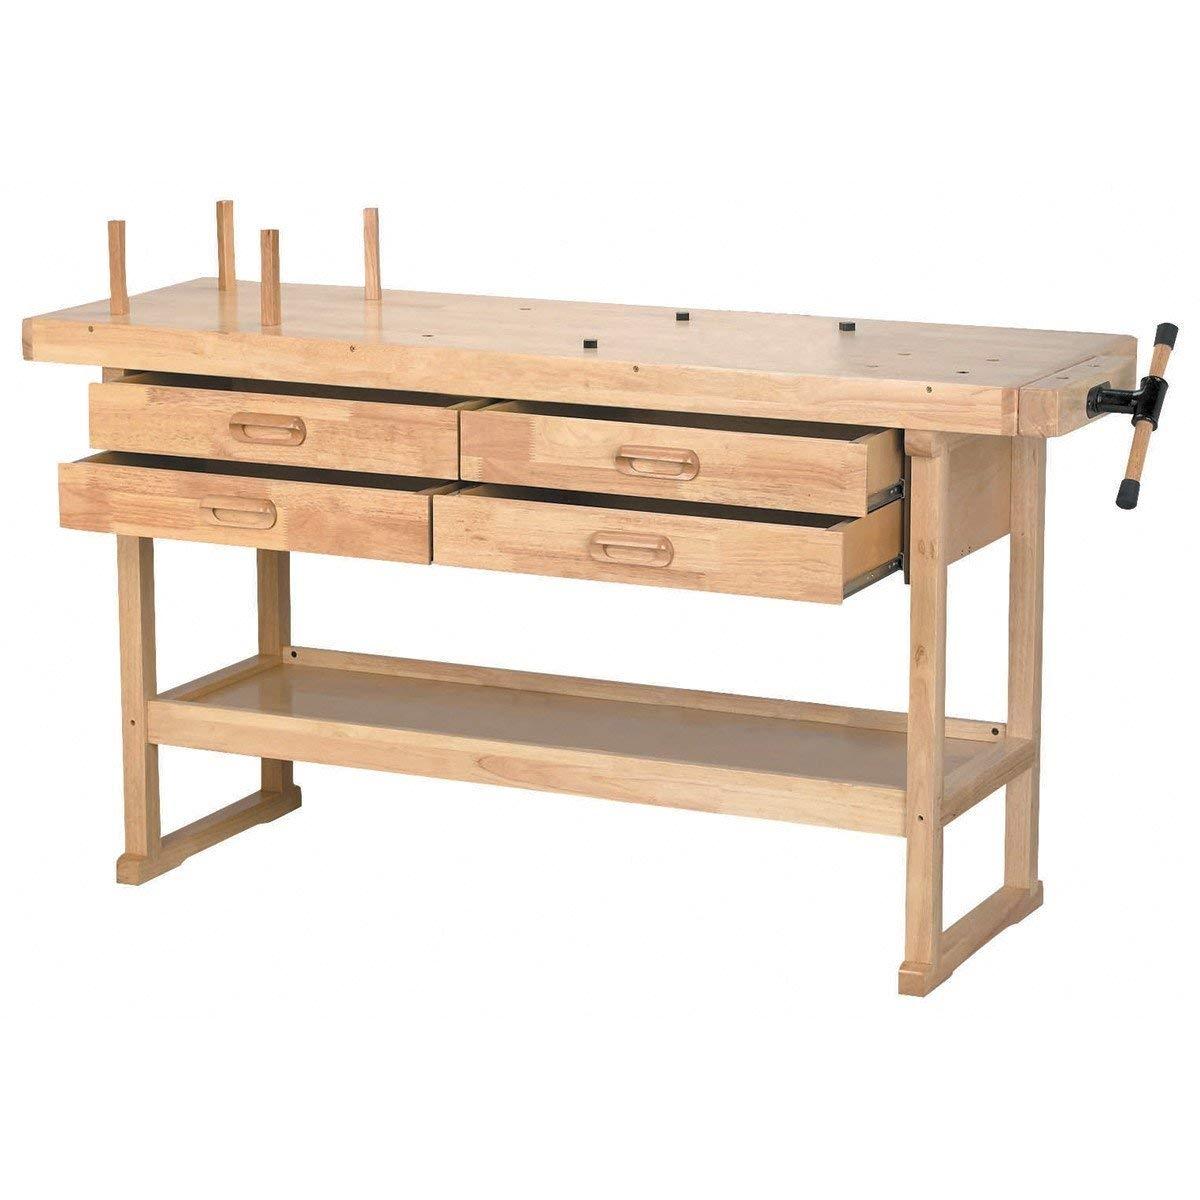 windsor design workbench with 4 drawers 60 hardwood work bench amazon com